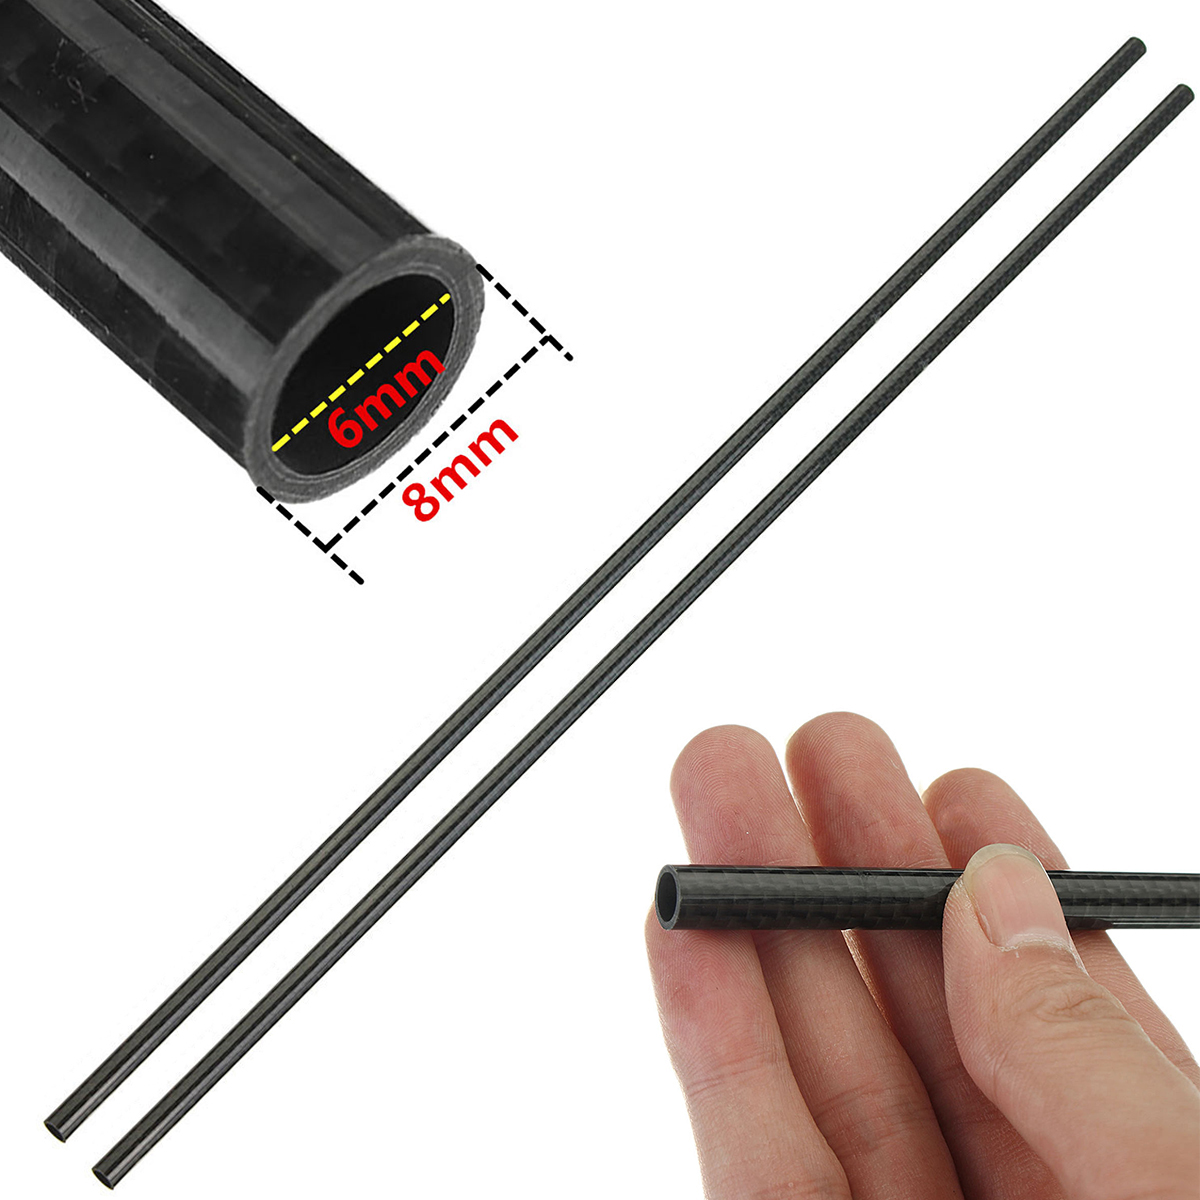 2pcs Mayitr 3k Roll Wrapped Carbon Fiber Tube Carbon Pipe OD 8mm ID 6mm Length 500mm цены онлайн